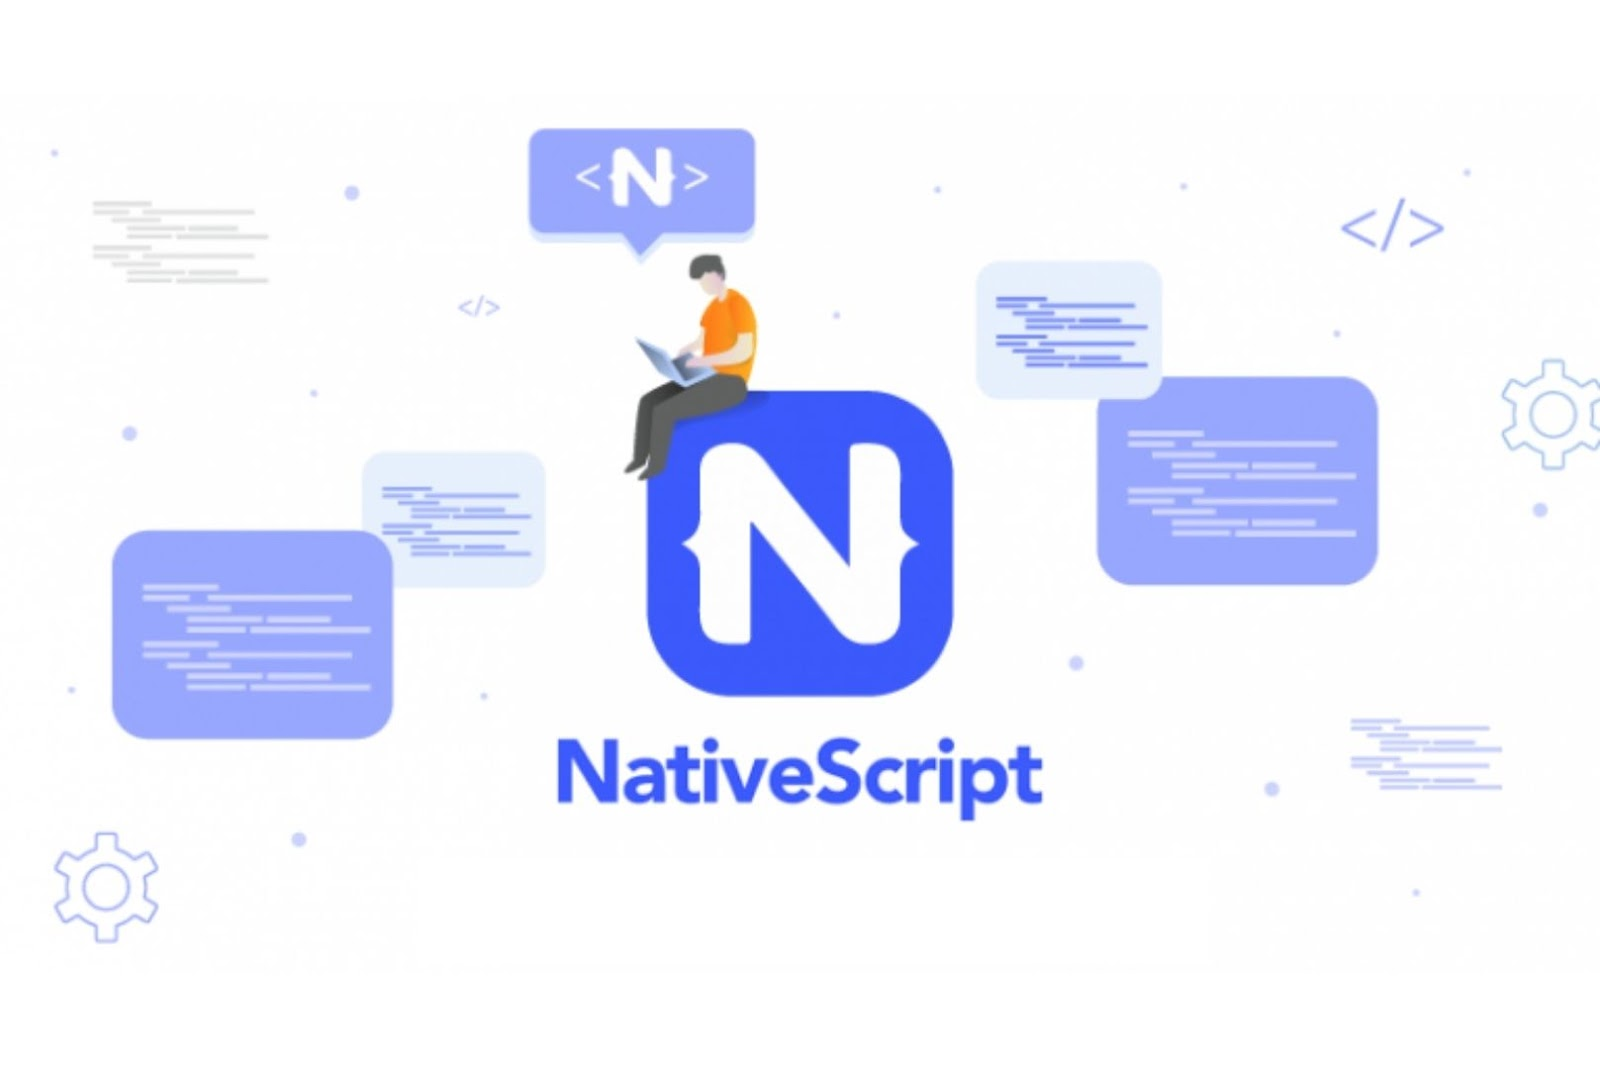 Native Script javascript framework